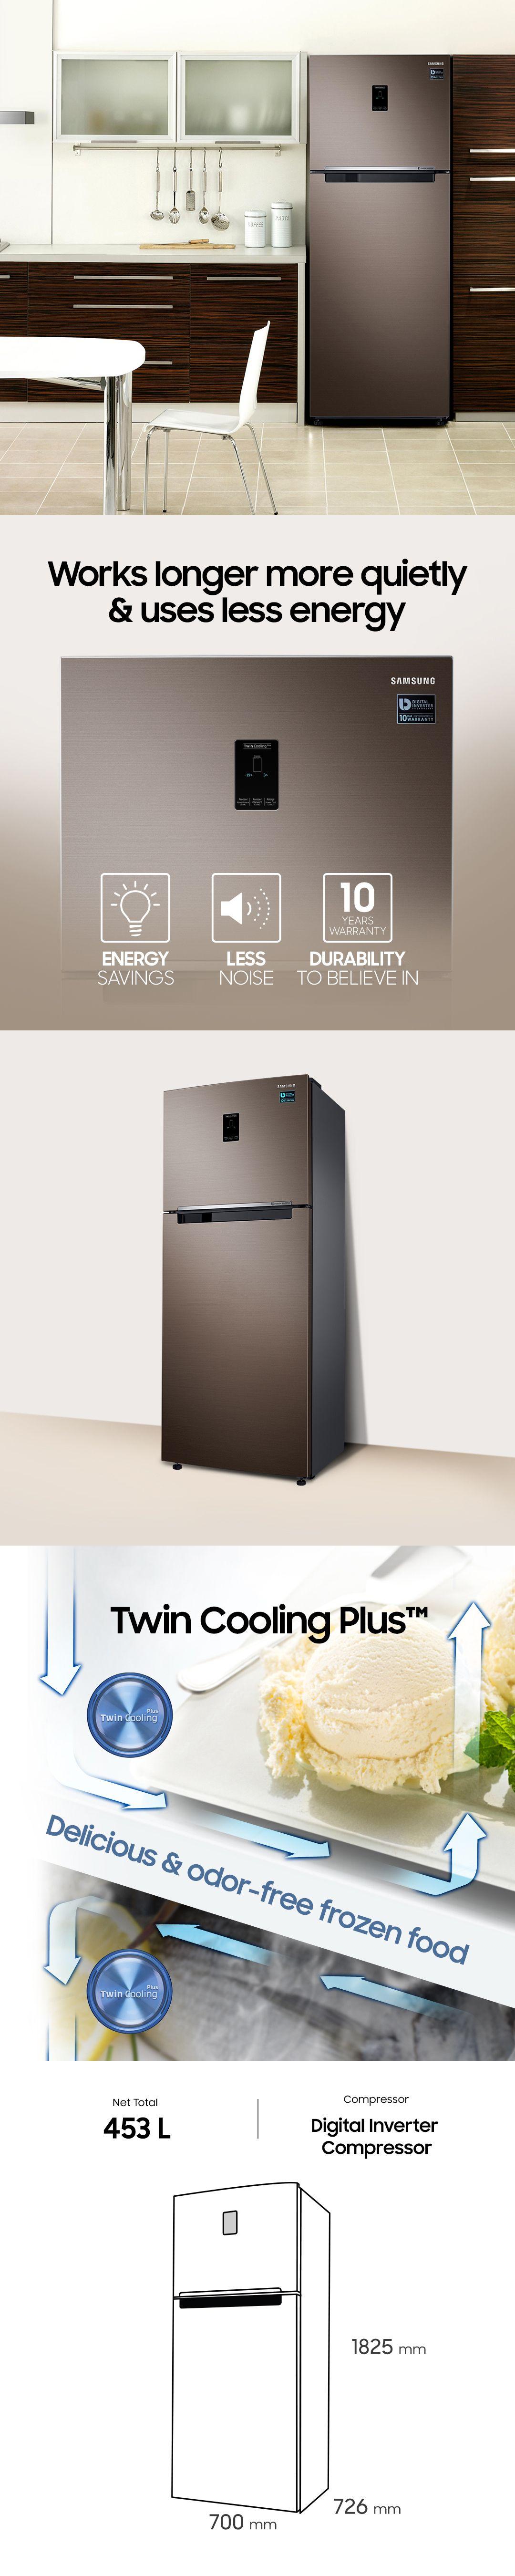 Digital Inverter Technology Automatically Adjusts The Compressor